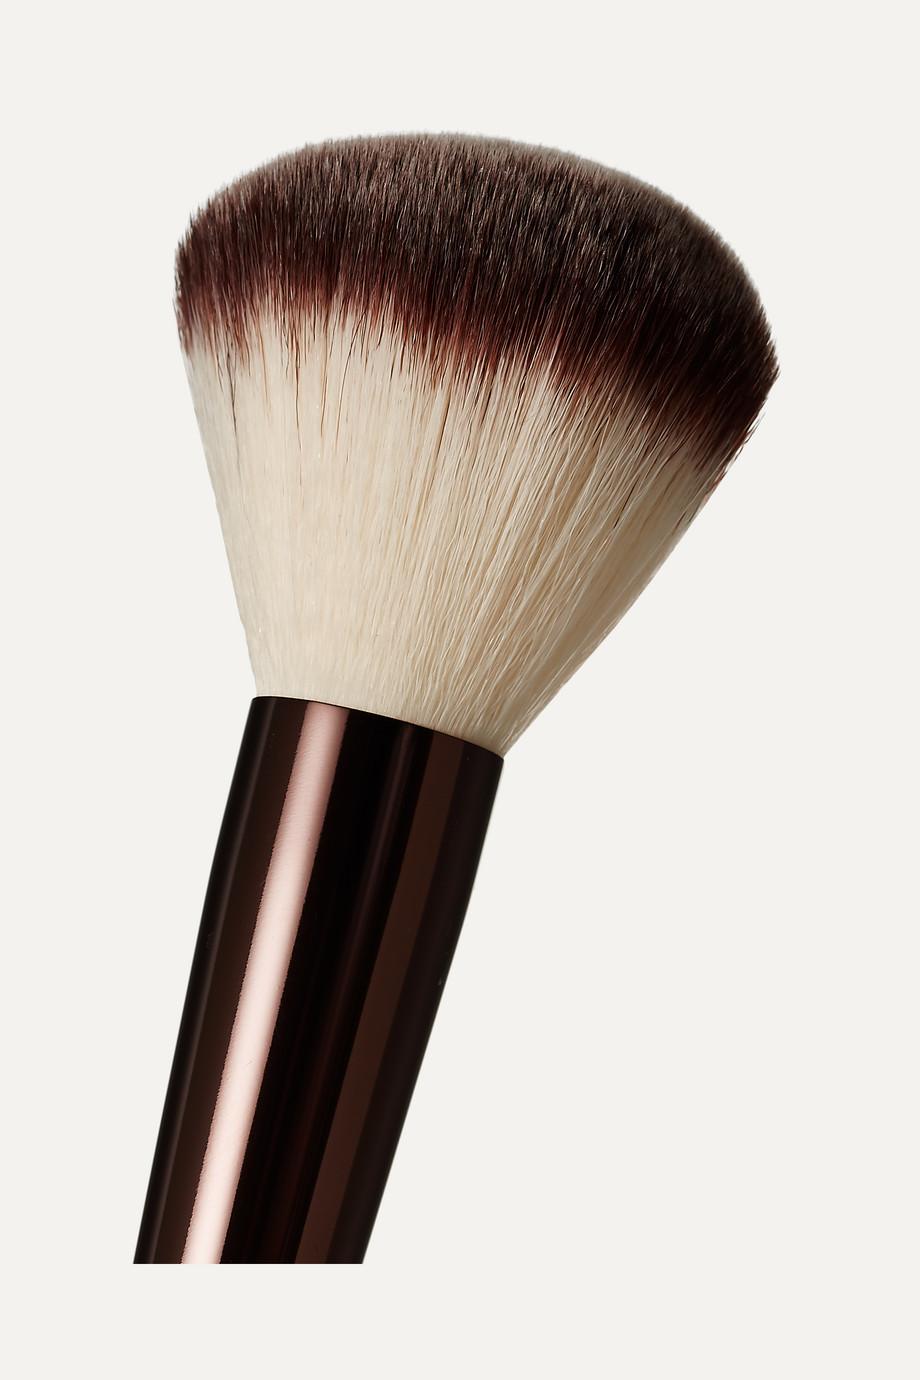 Hourglass Nº 1 Powder Brush